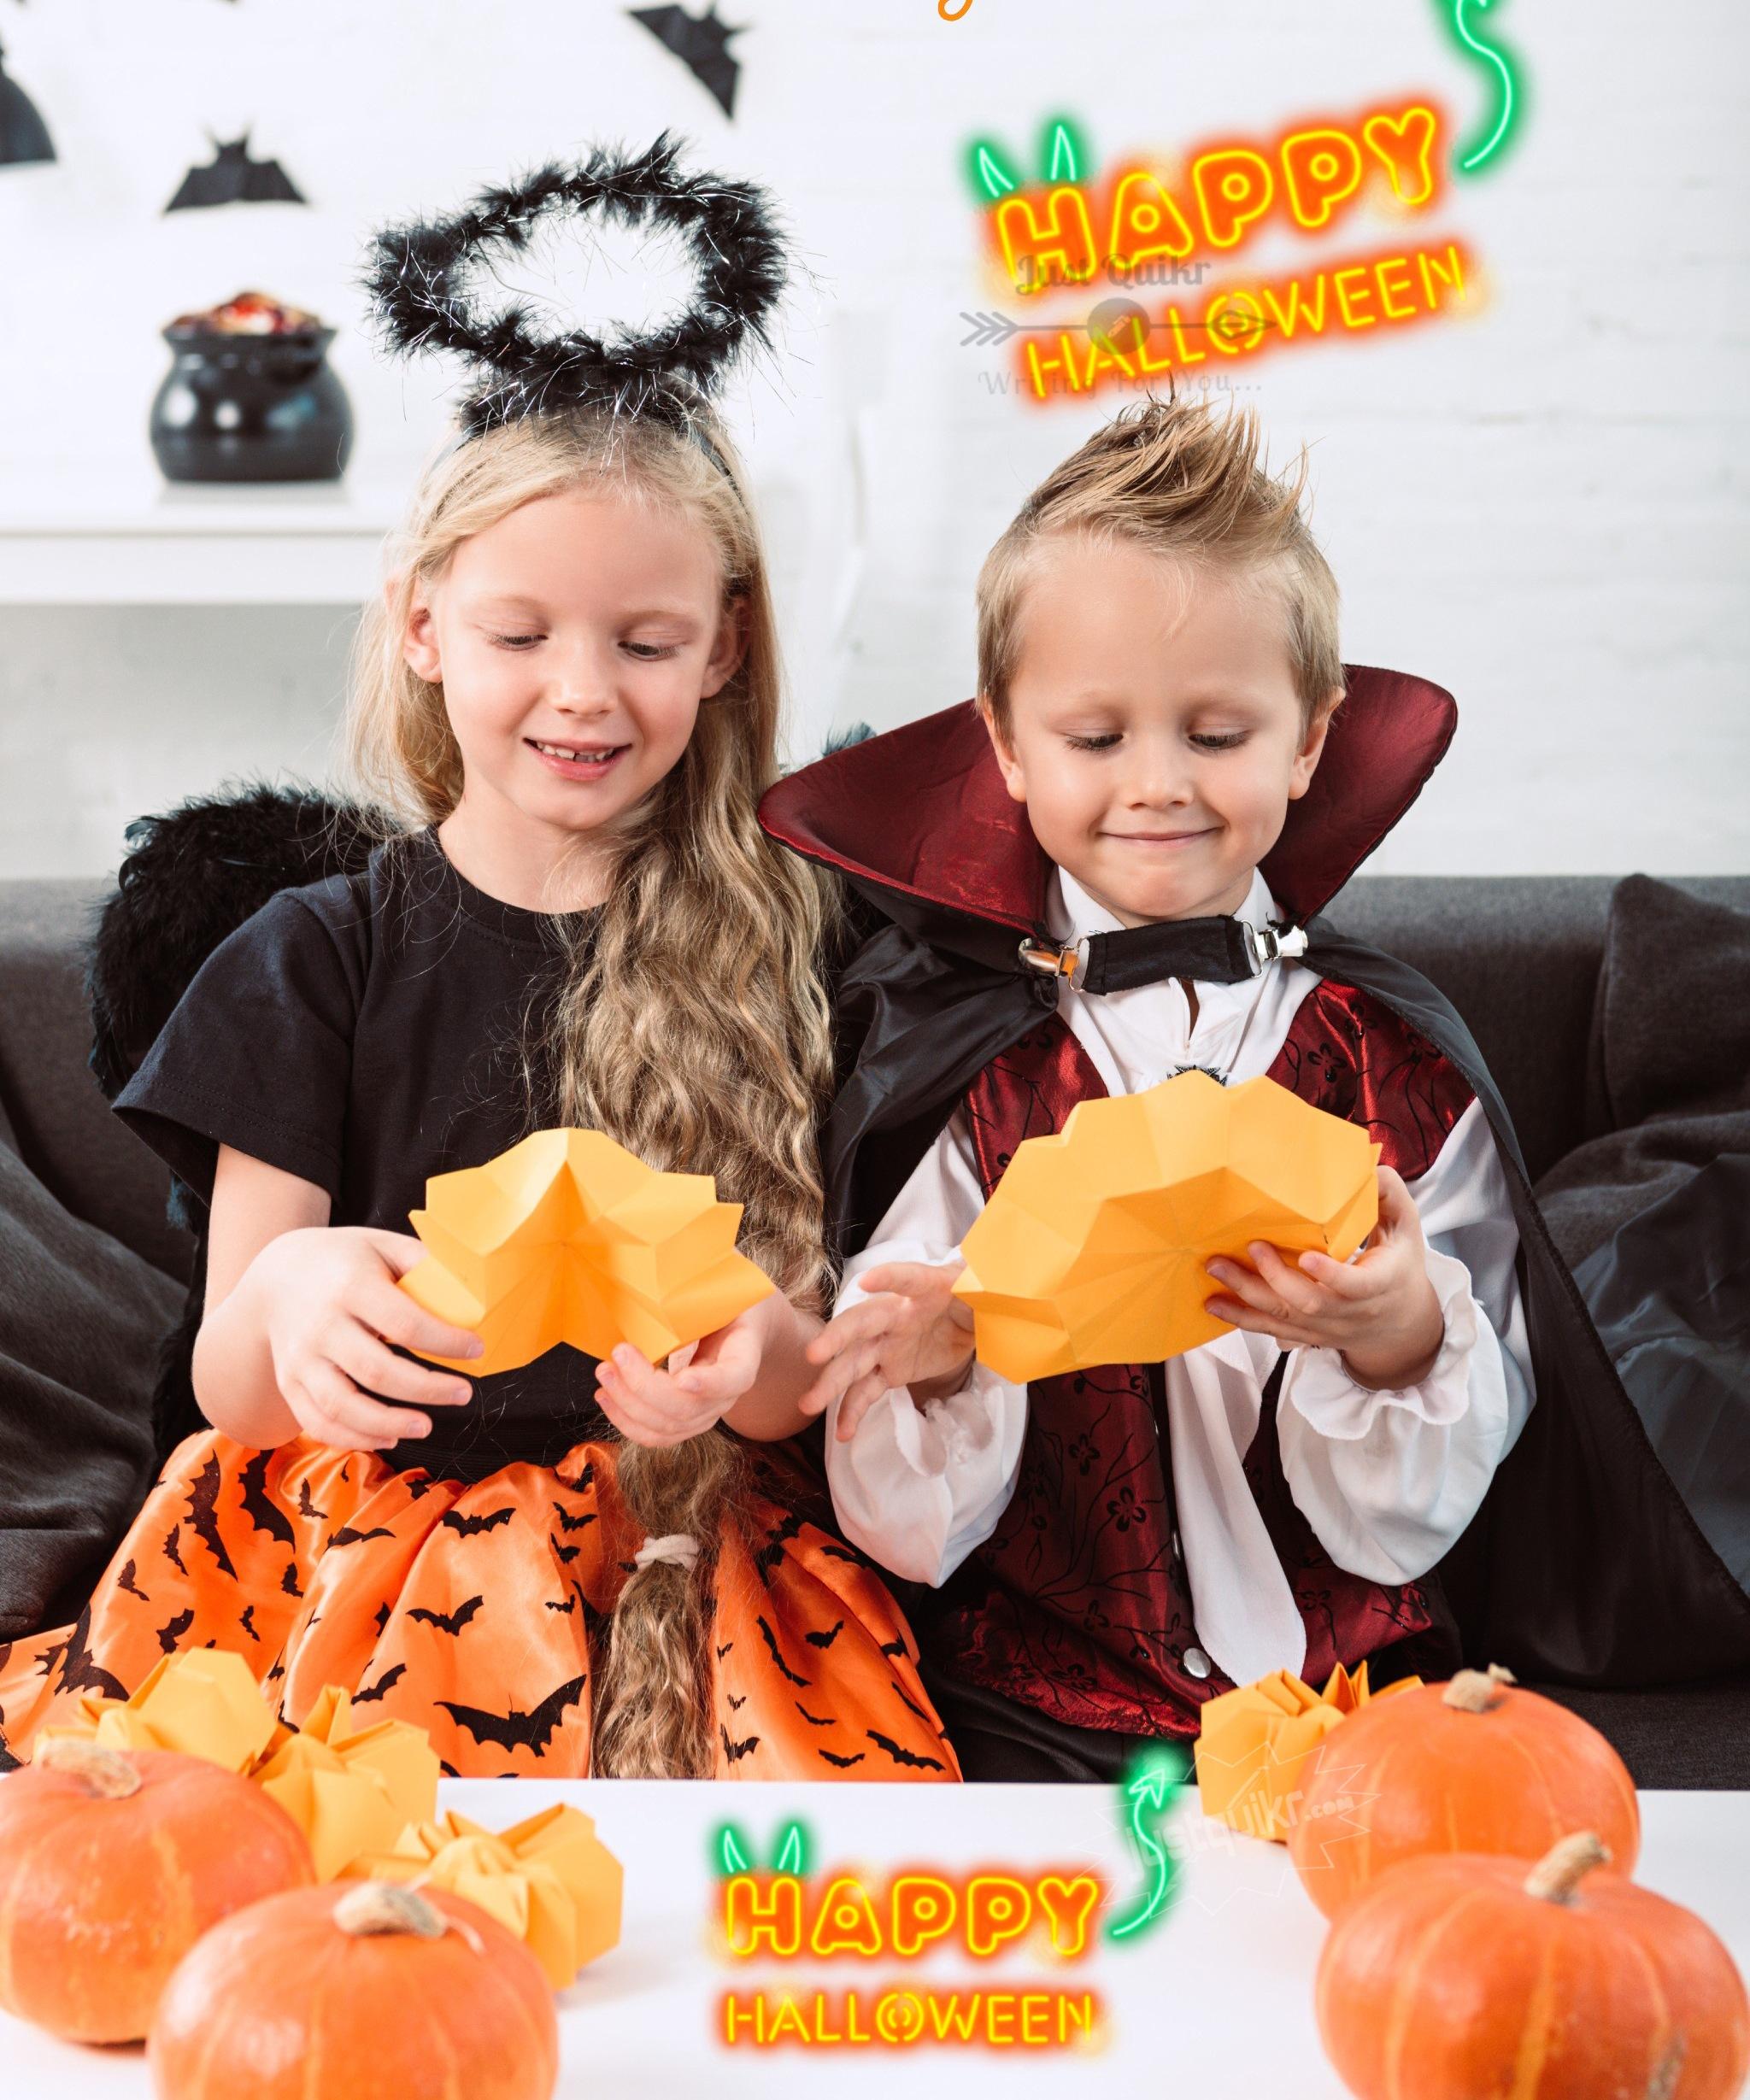 Halloween Day Dress Ideas for Friends